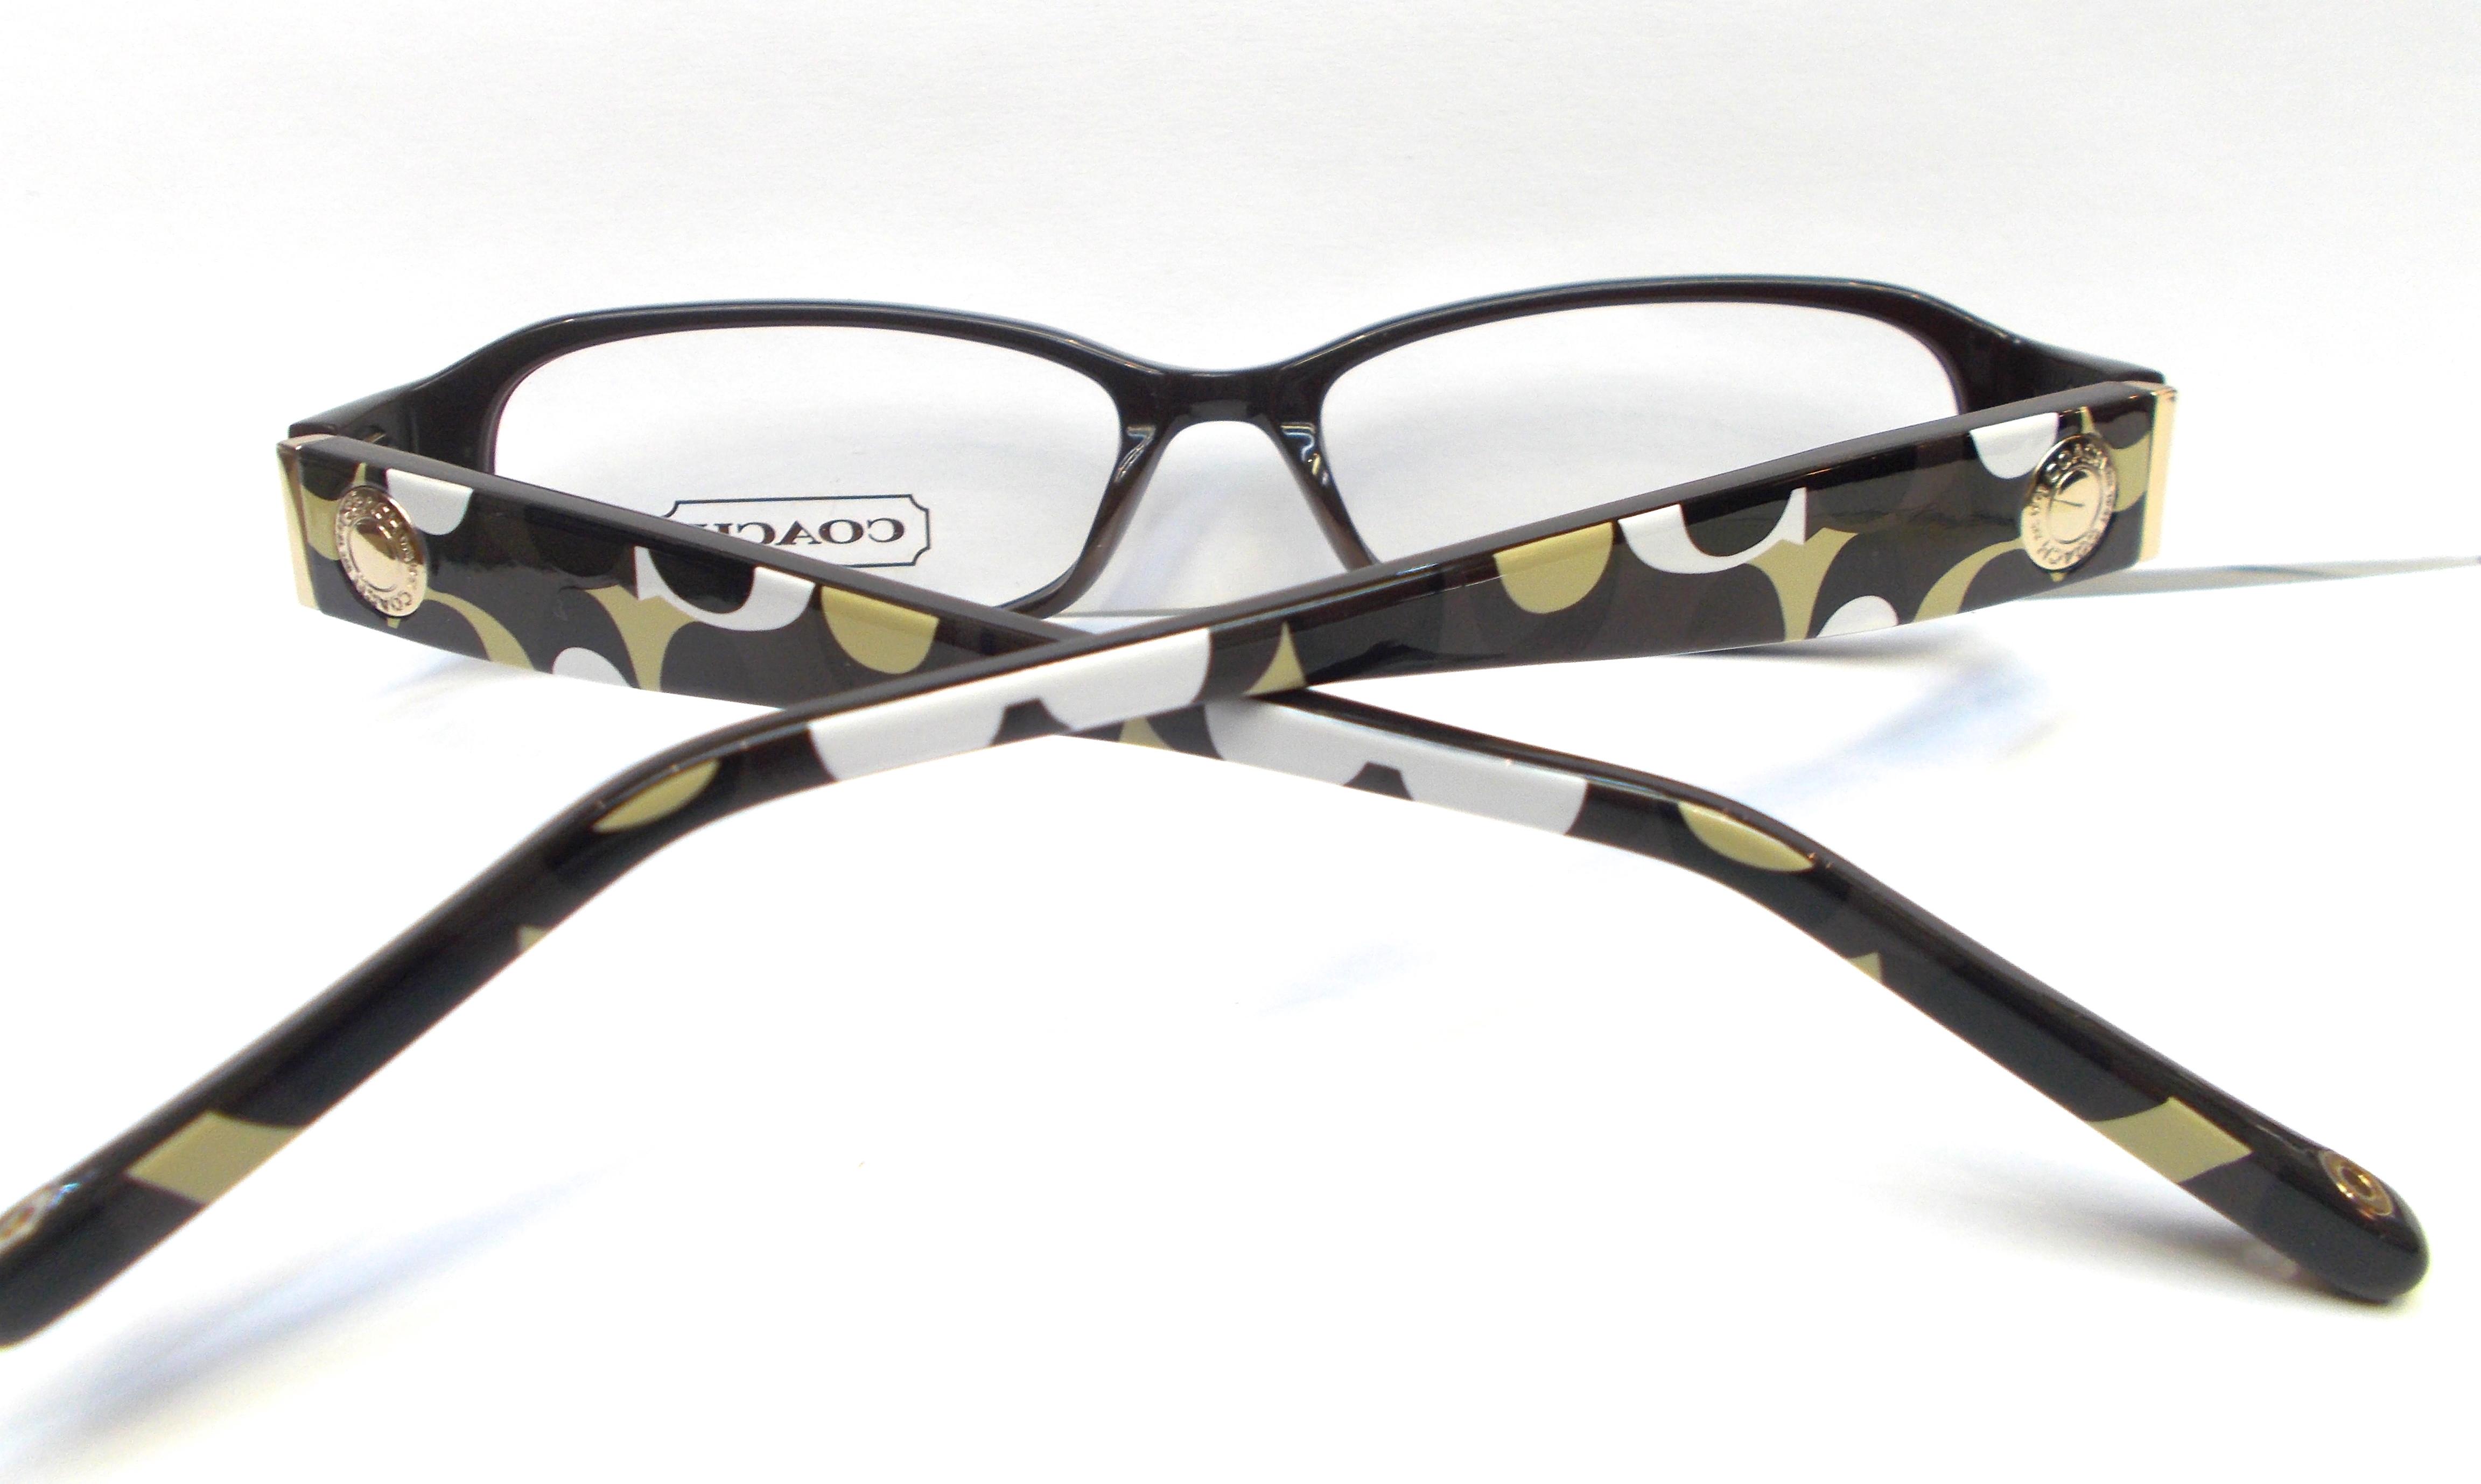 Coach Eyewear Roberta  843  Brown - Thumbnail 2Coach Prescription Glasses